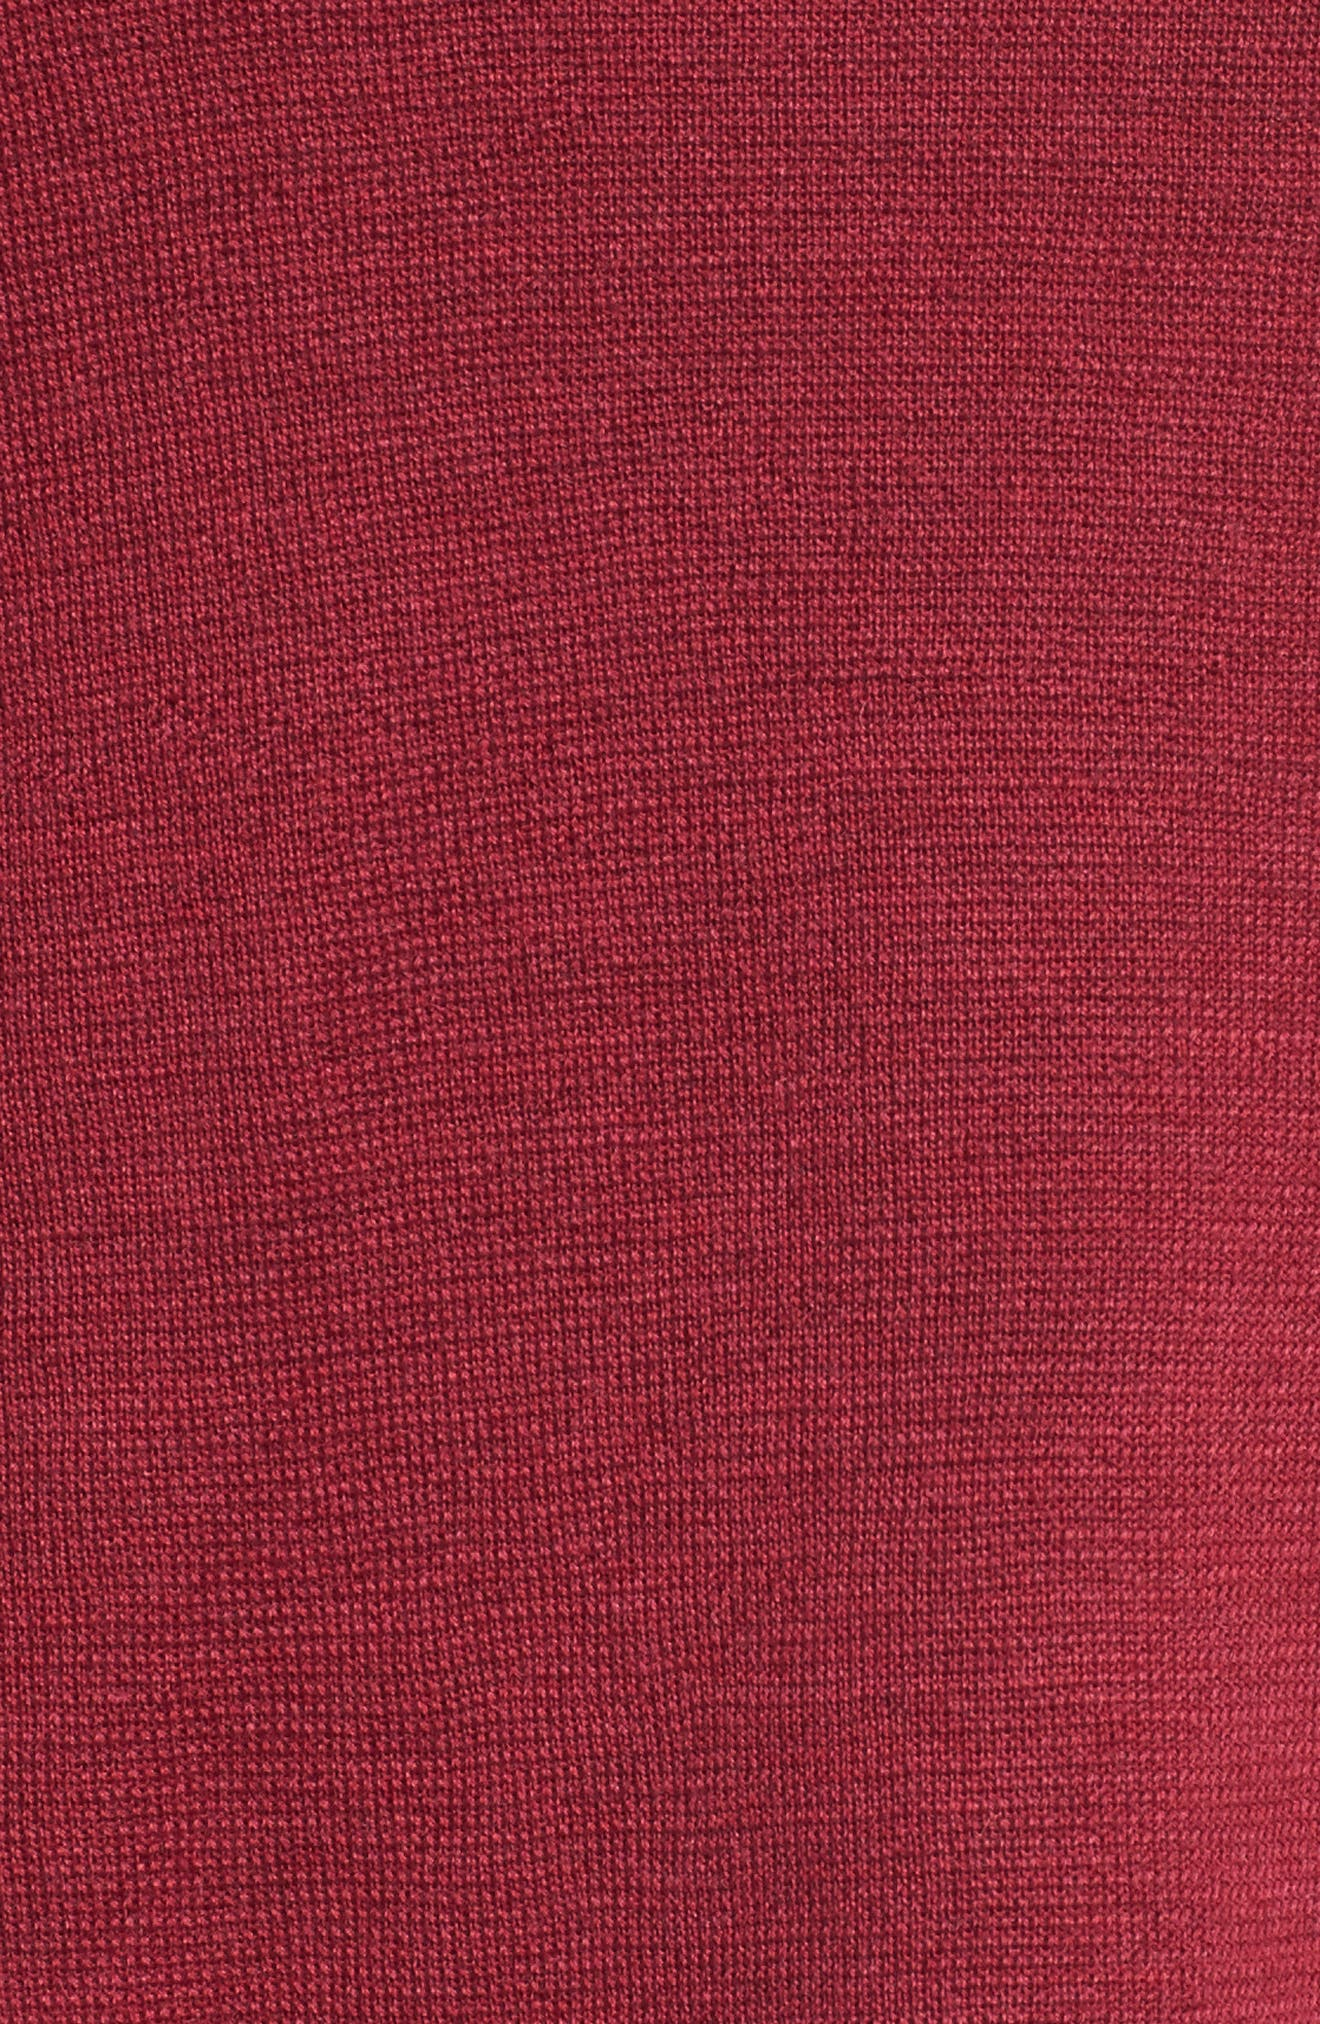 Merino Wool Sweater Dress,                             Alternate thumbnail 5, color,                             Hibiscus